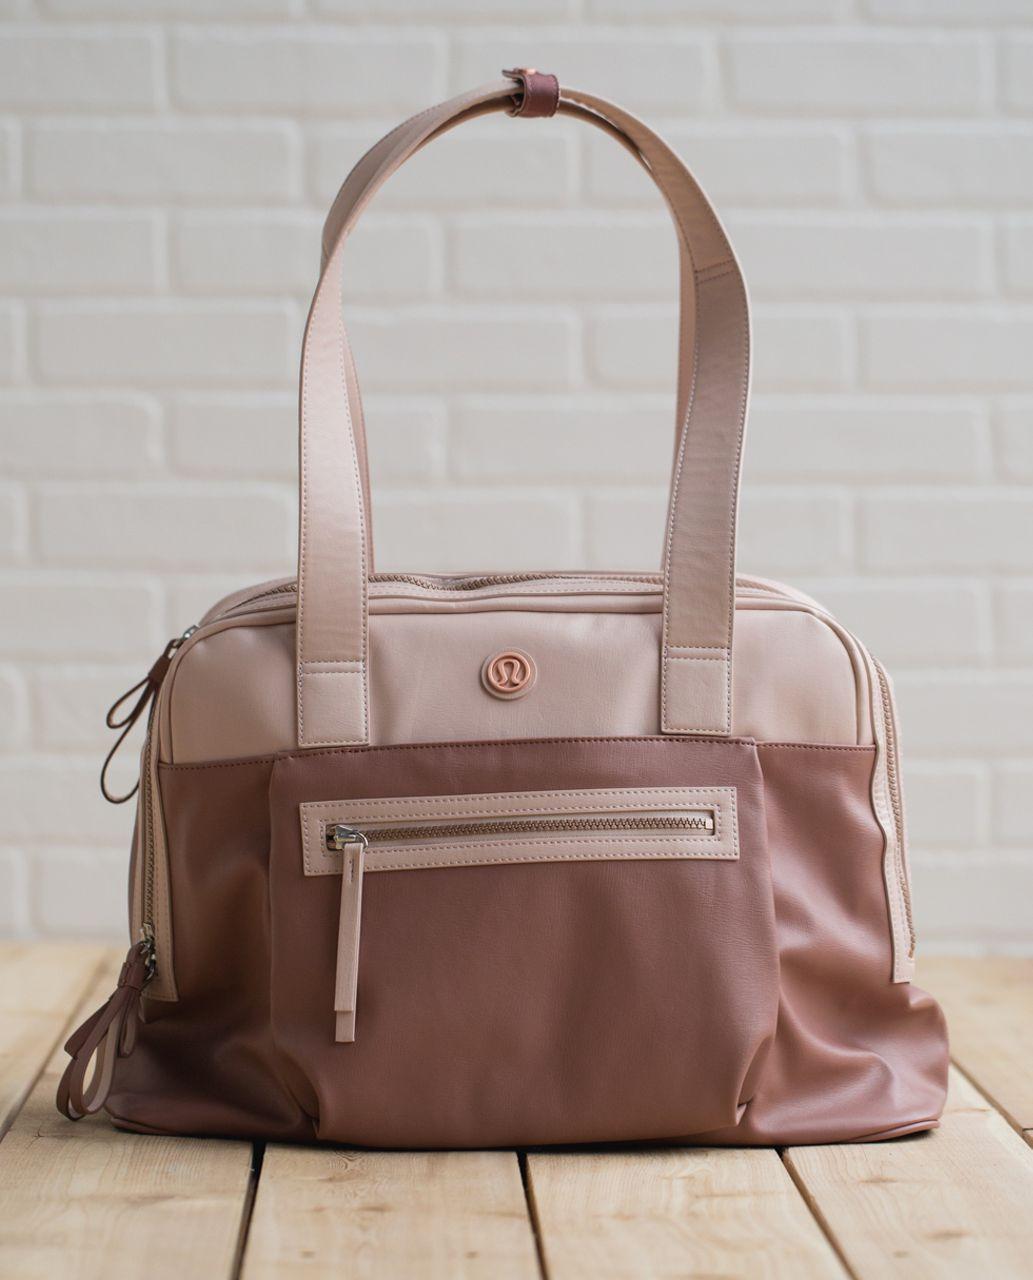 4716c88d7d Travel Bag For Gym Clothes - Dream Shuttles